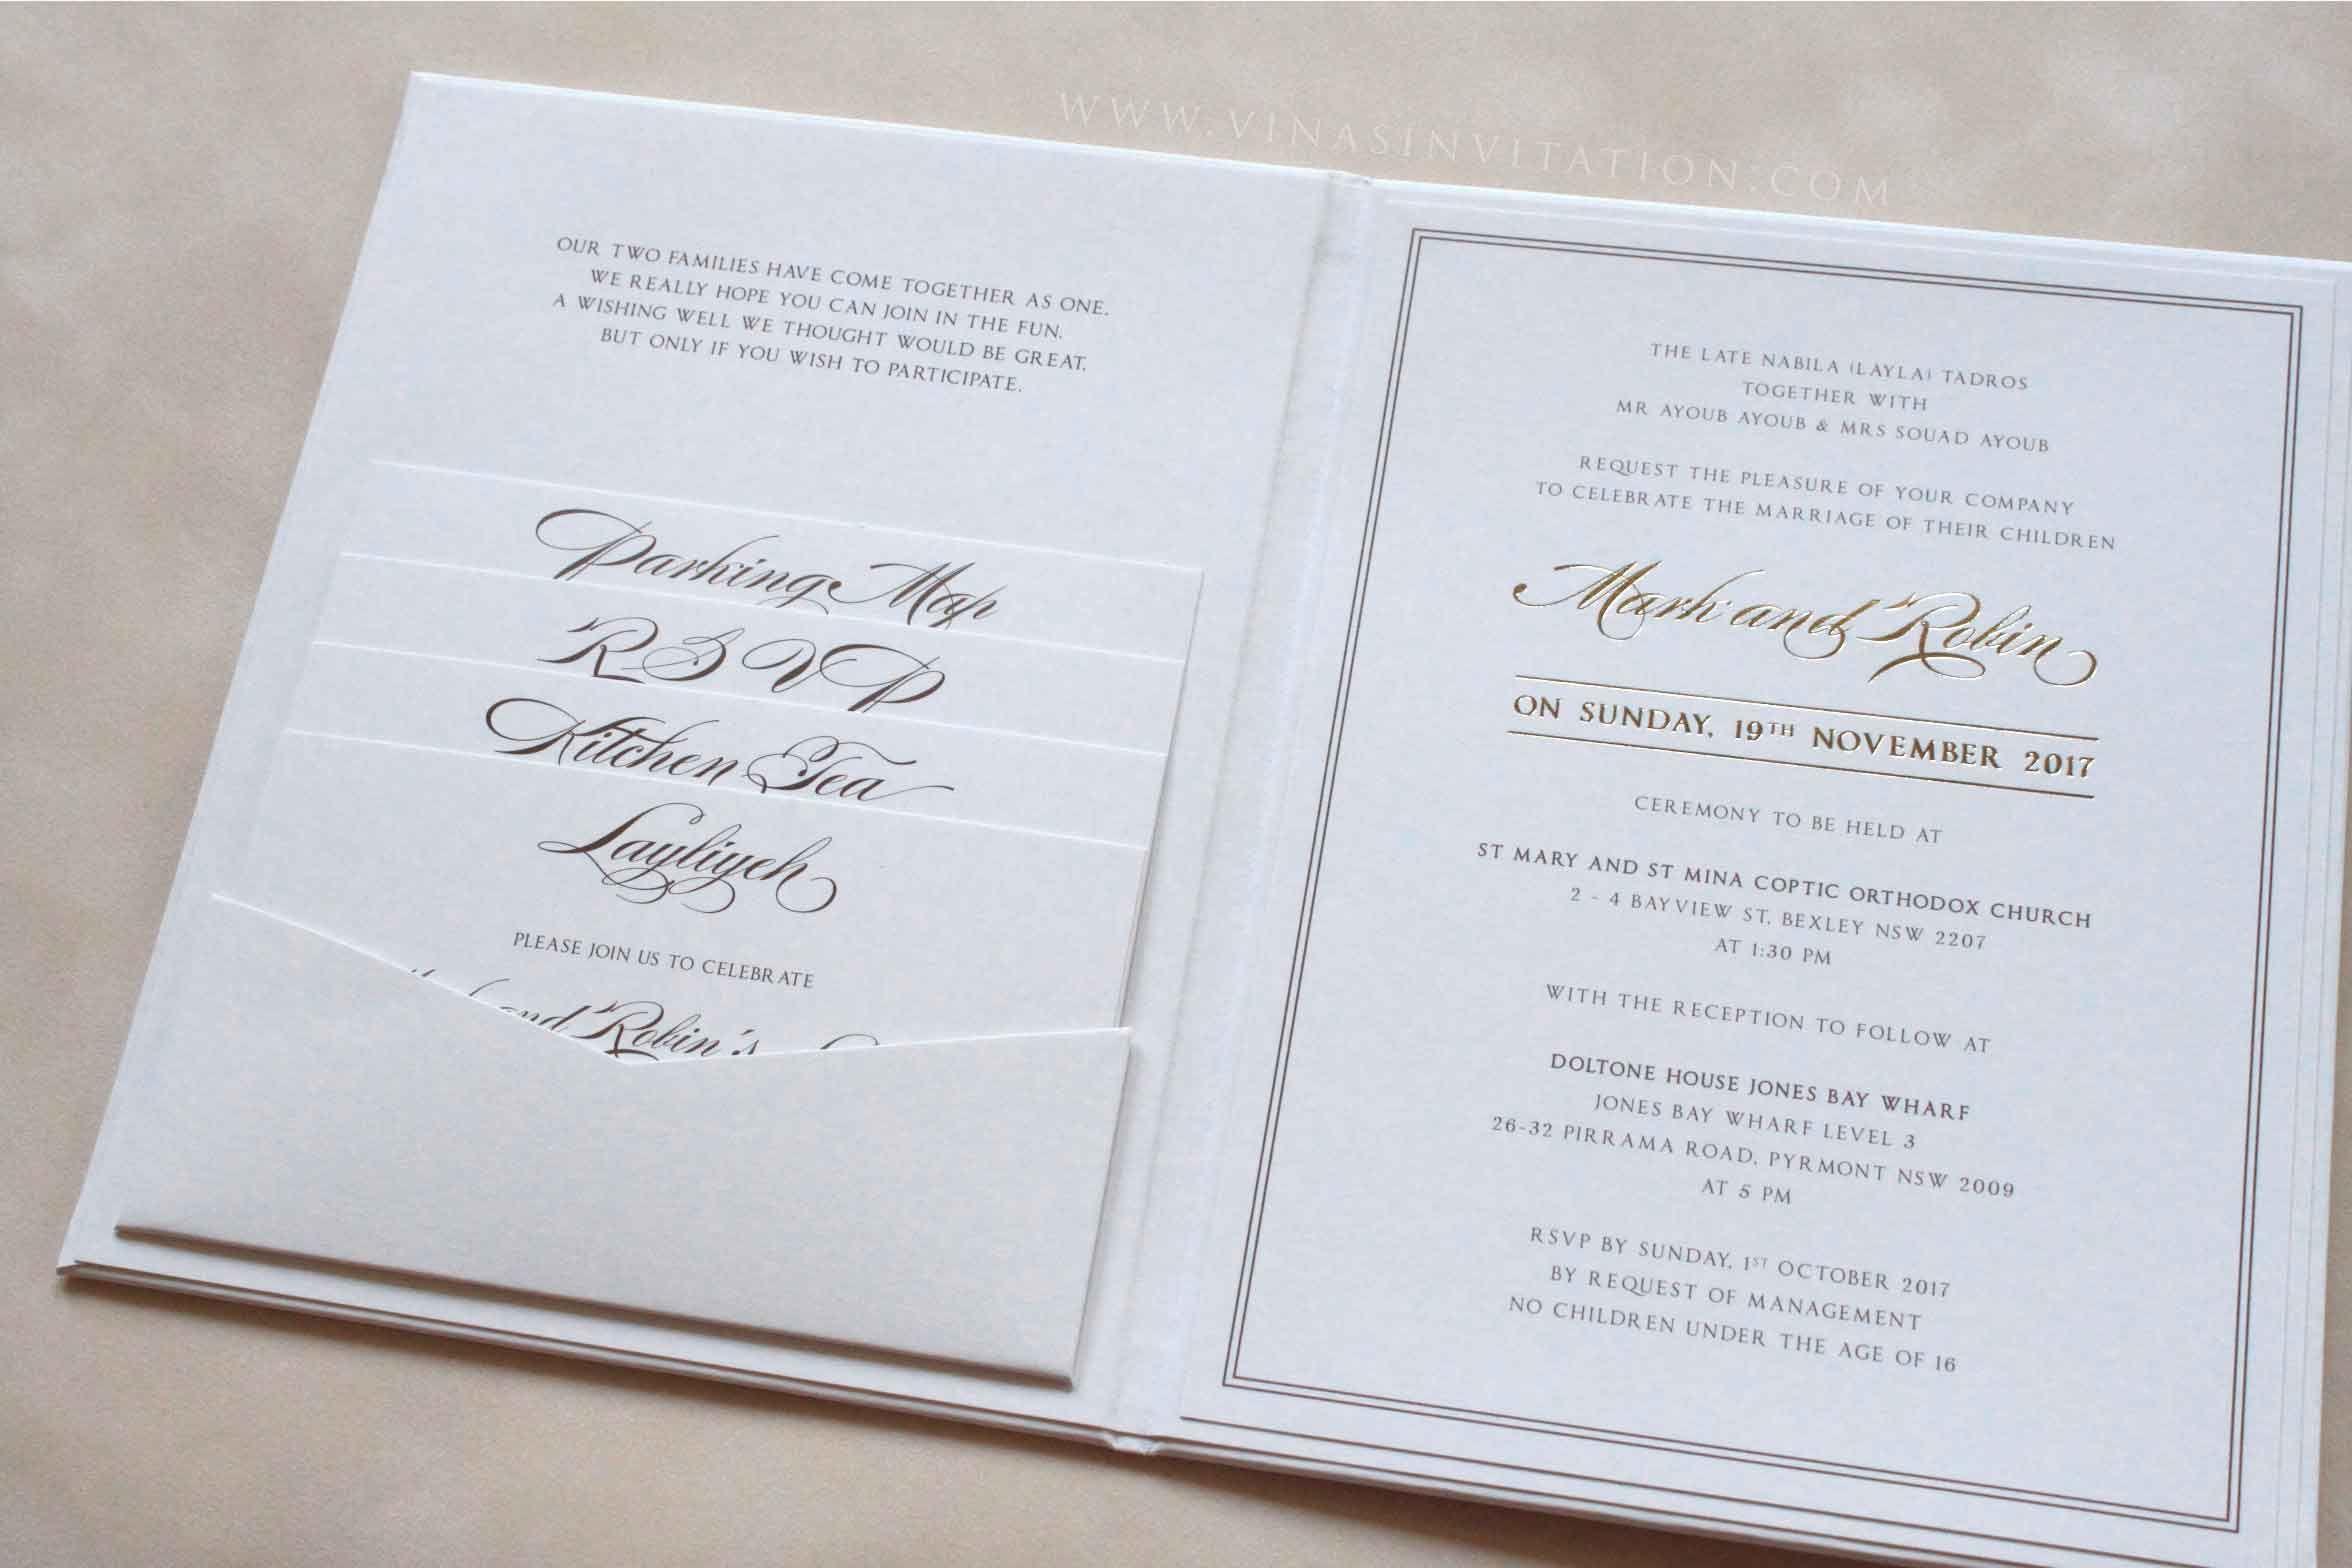 vinas invitation. wedding invitation semarang. wedding invitation ...